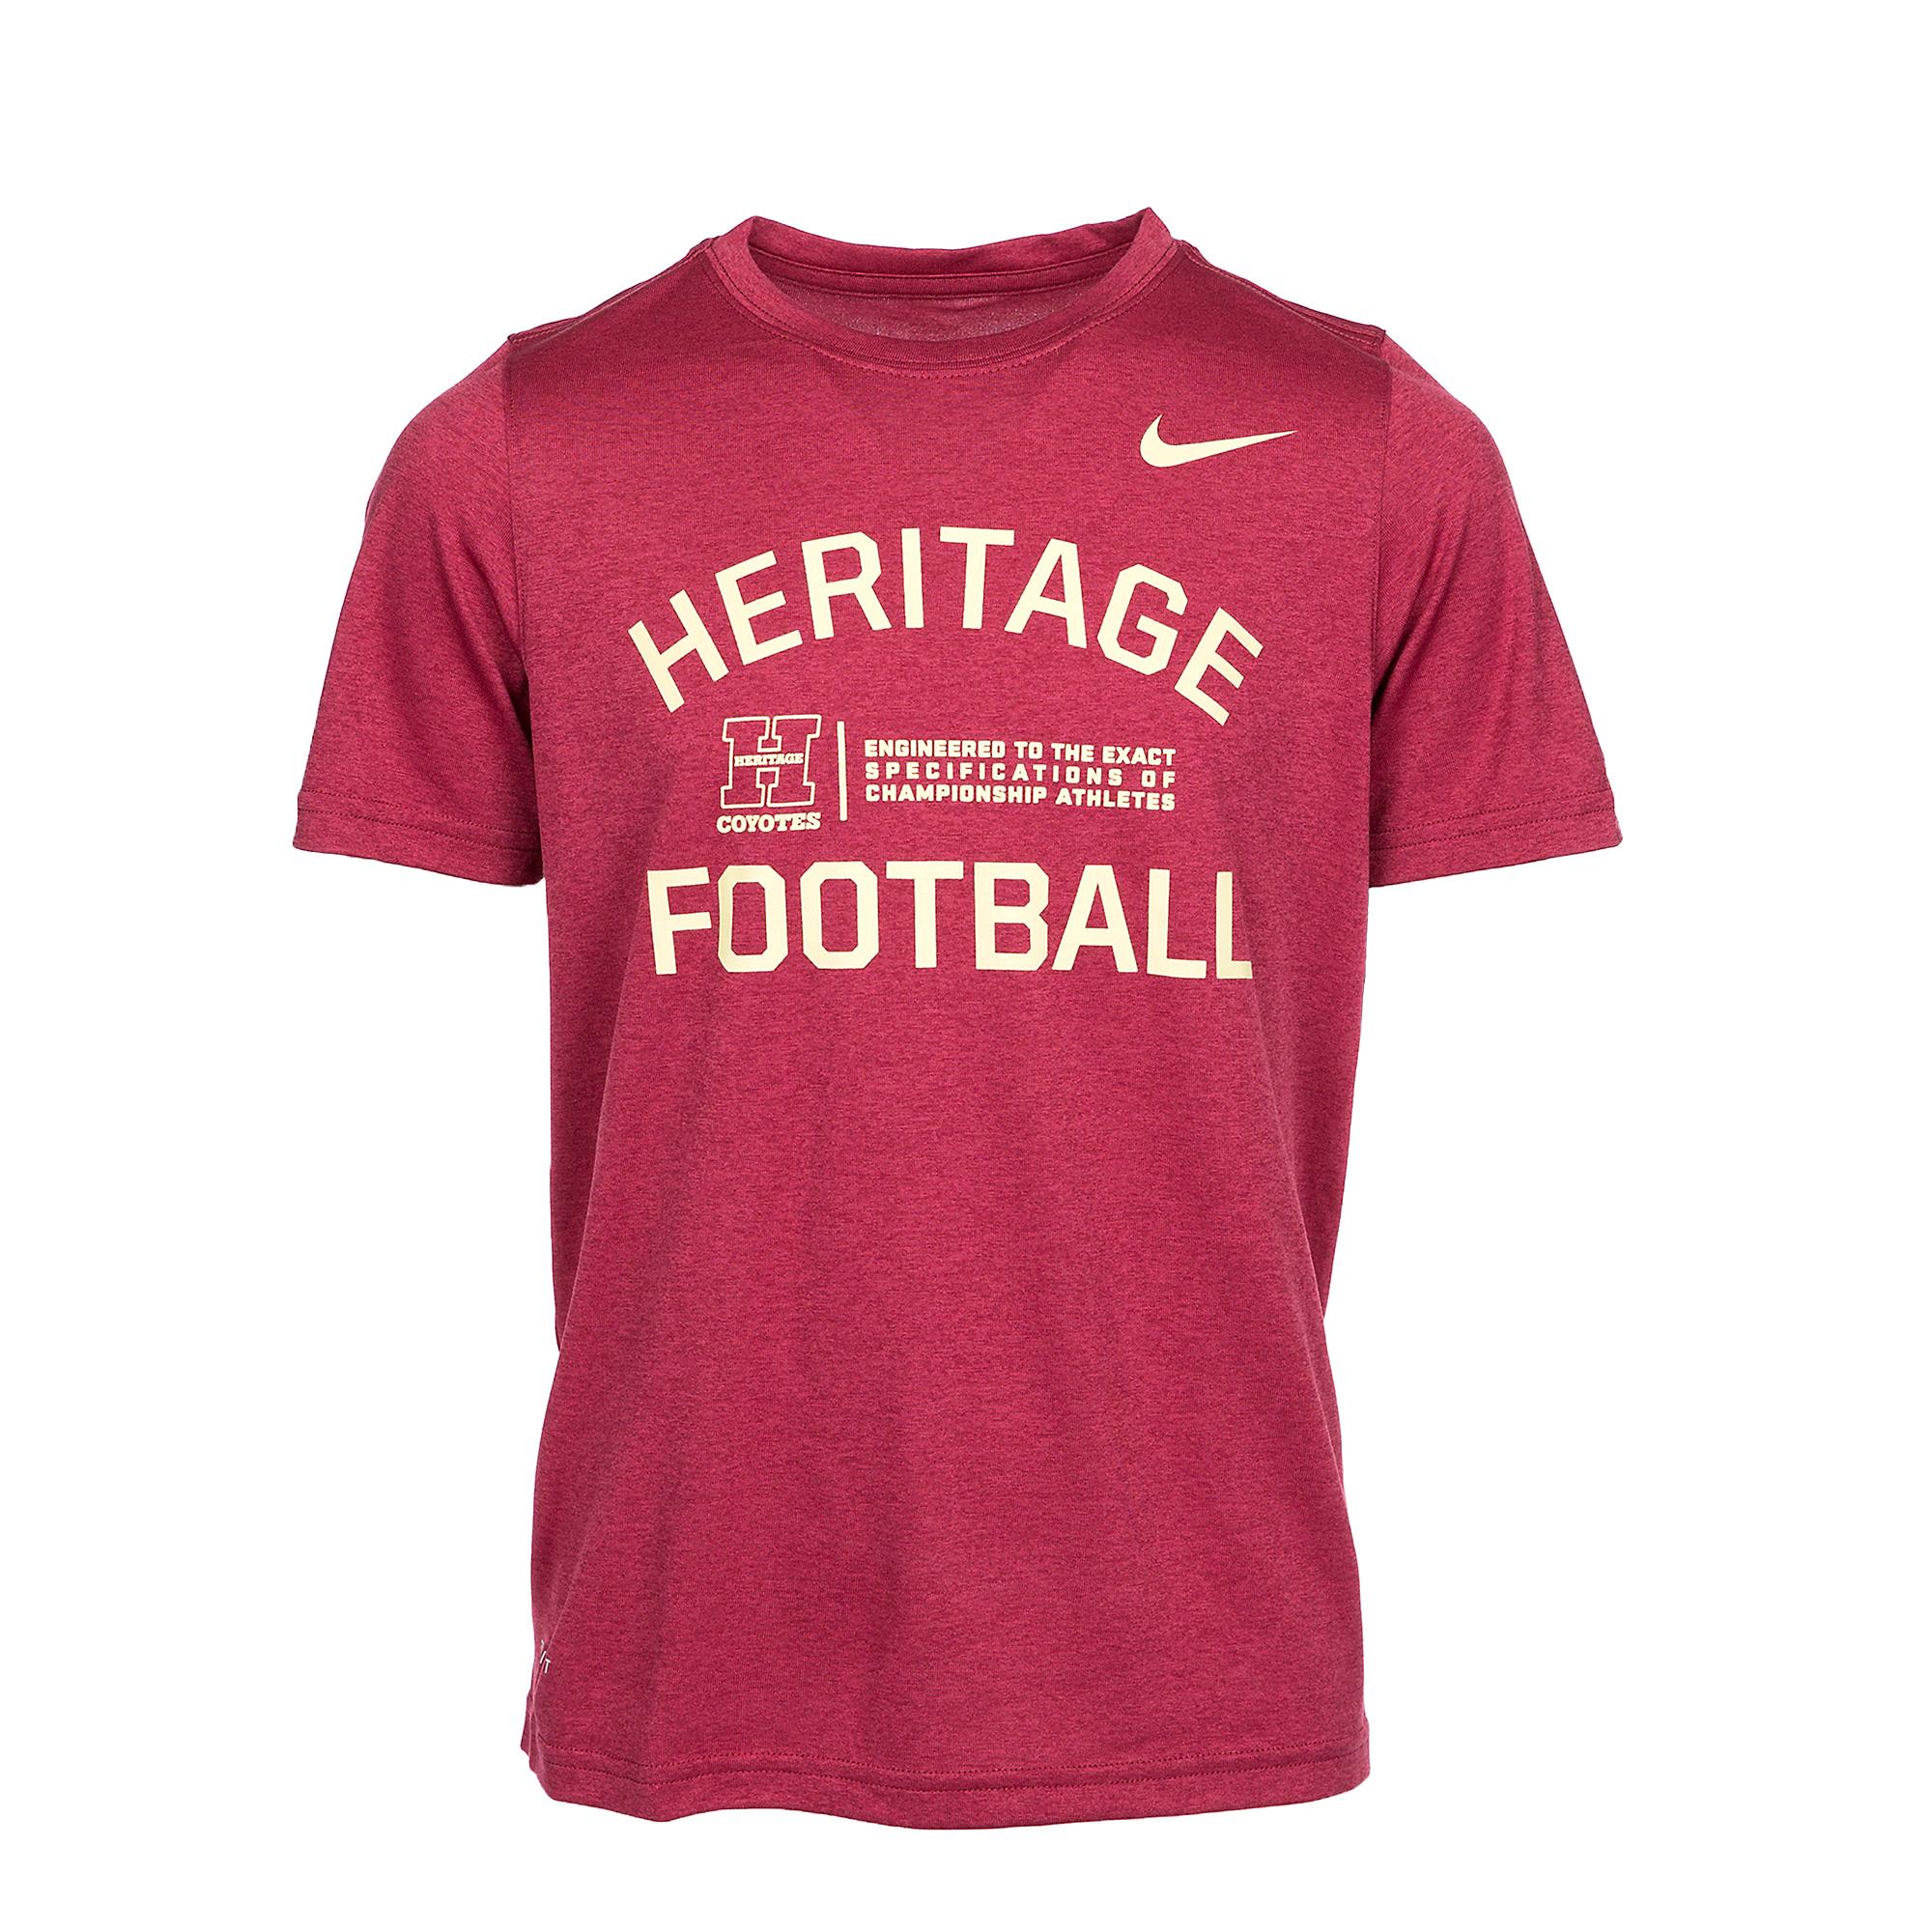 Heritage Coyotes Nike Boys Legend Short Sleeve Tee